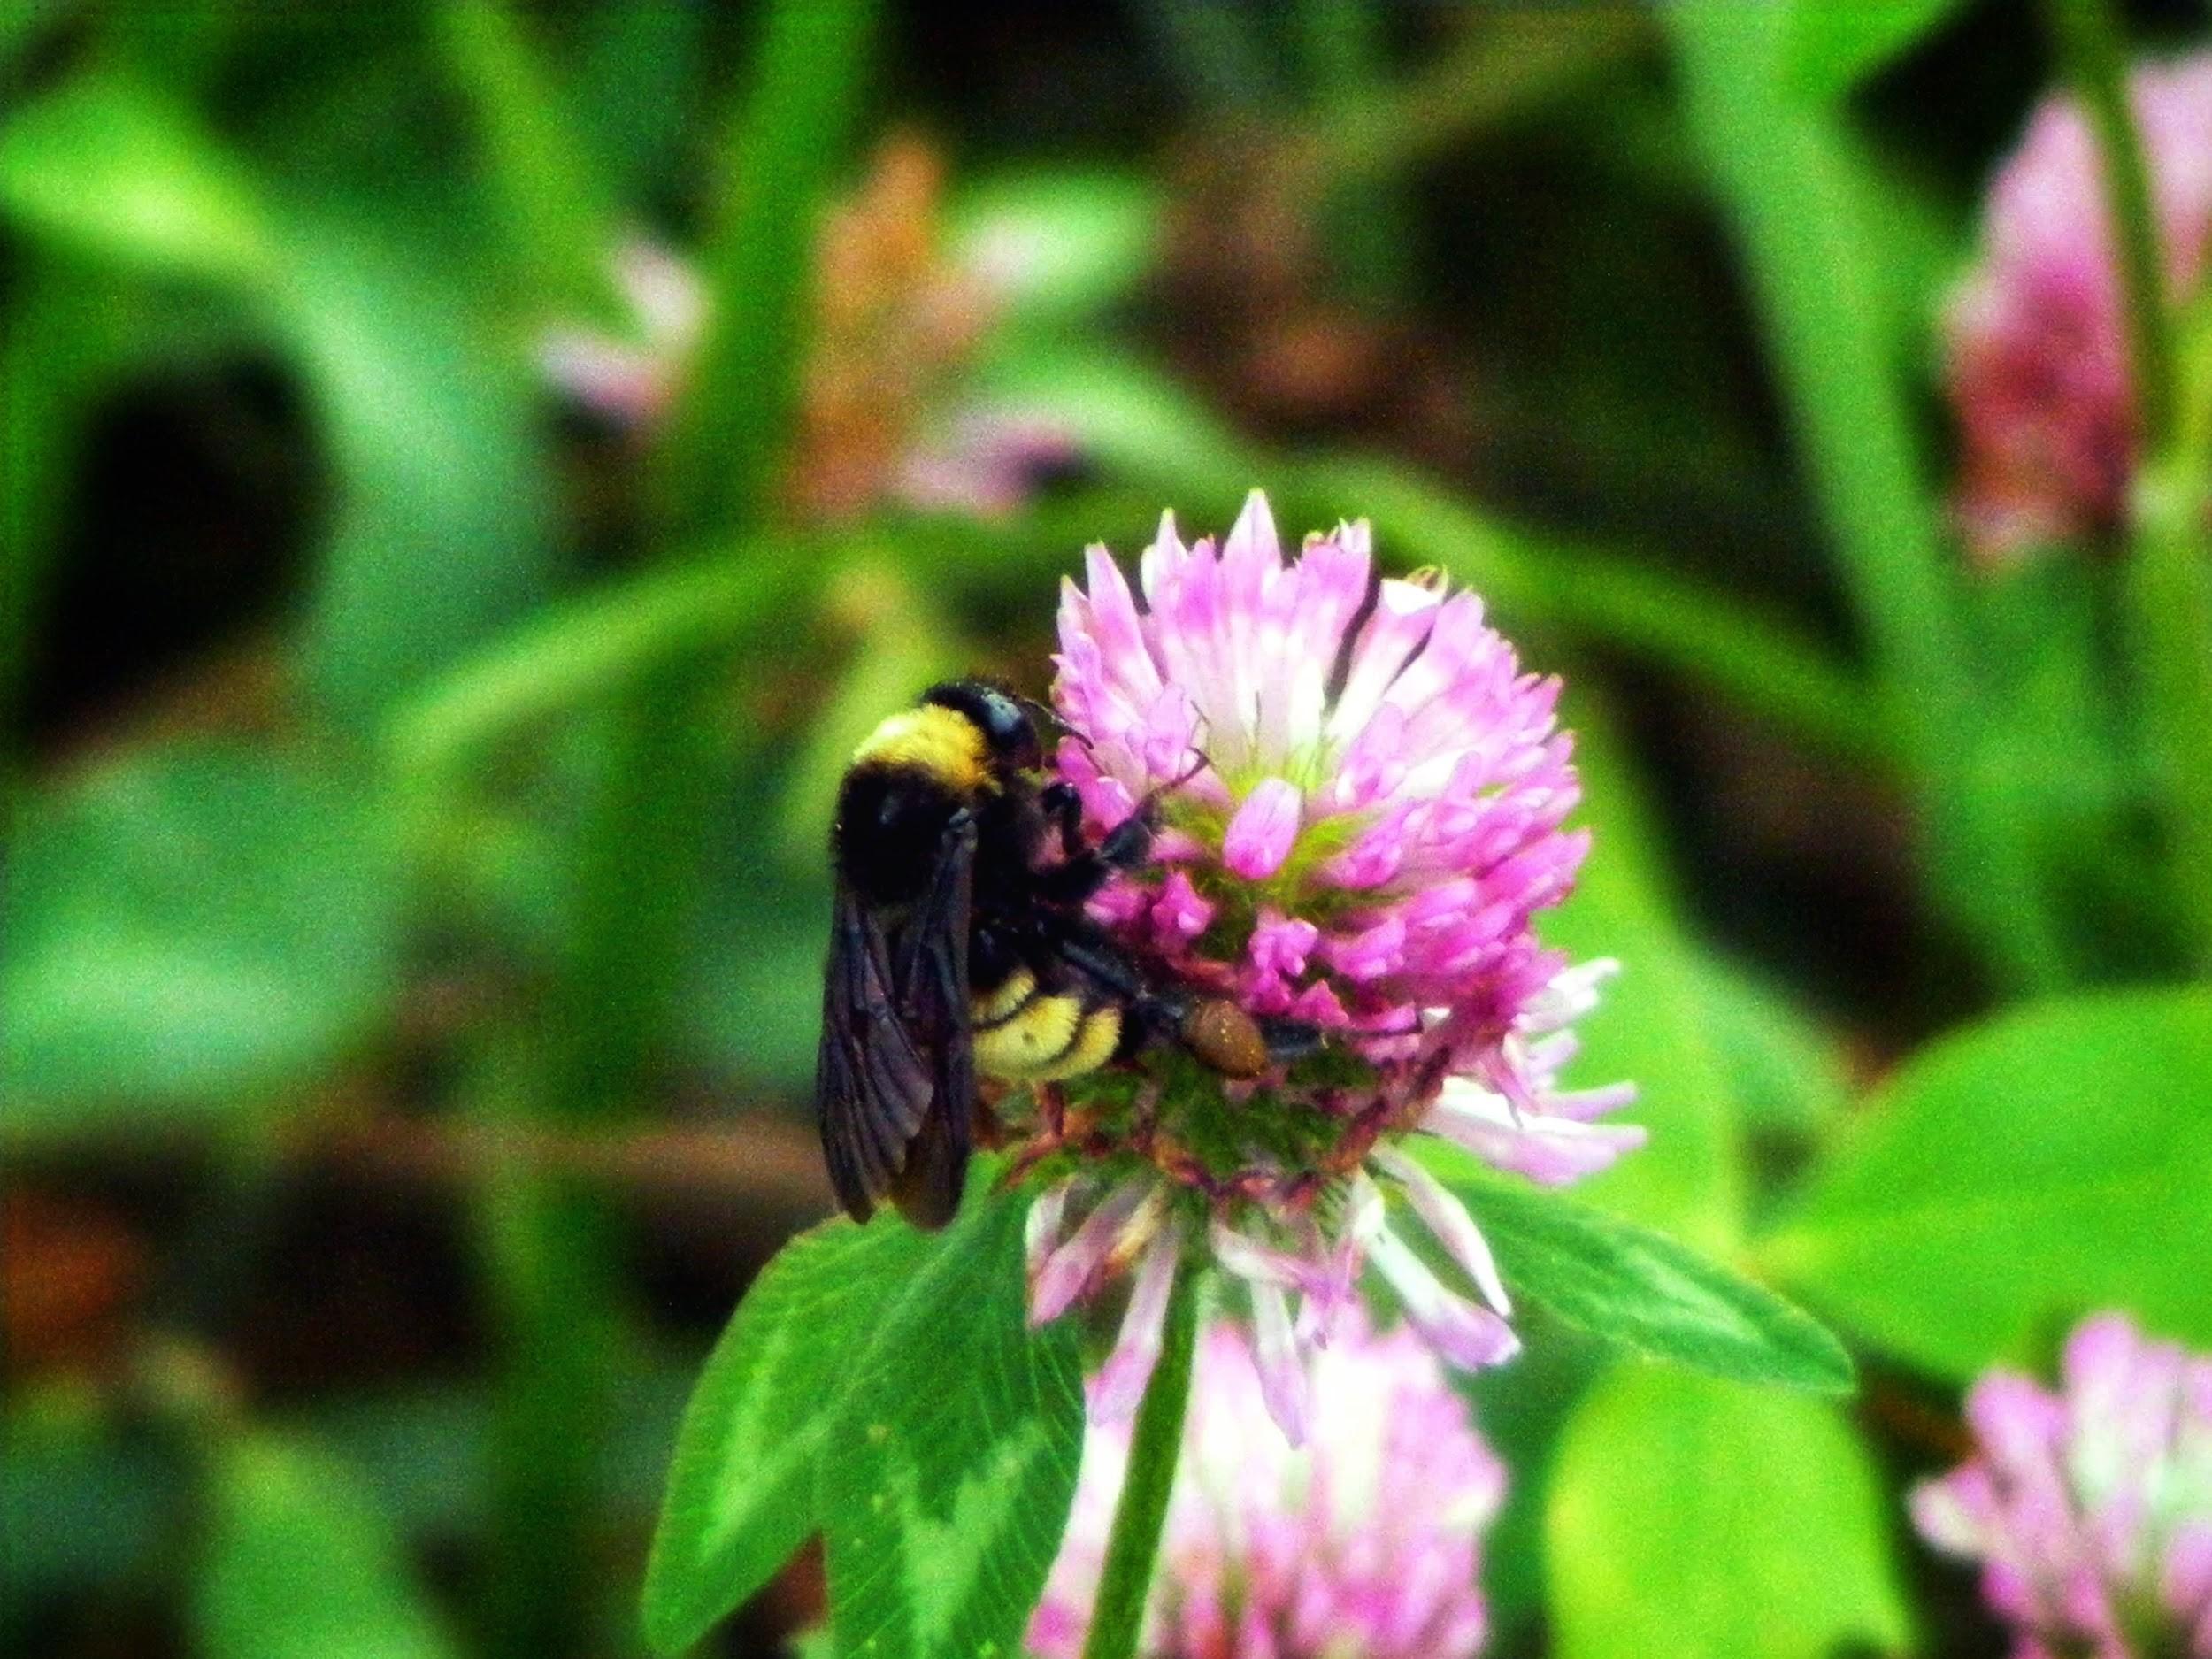 American bumble bee Photo Credit: Jose Montalva